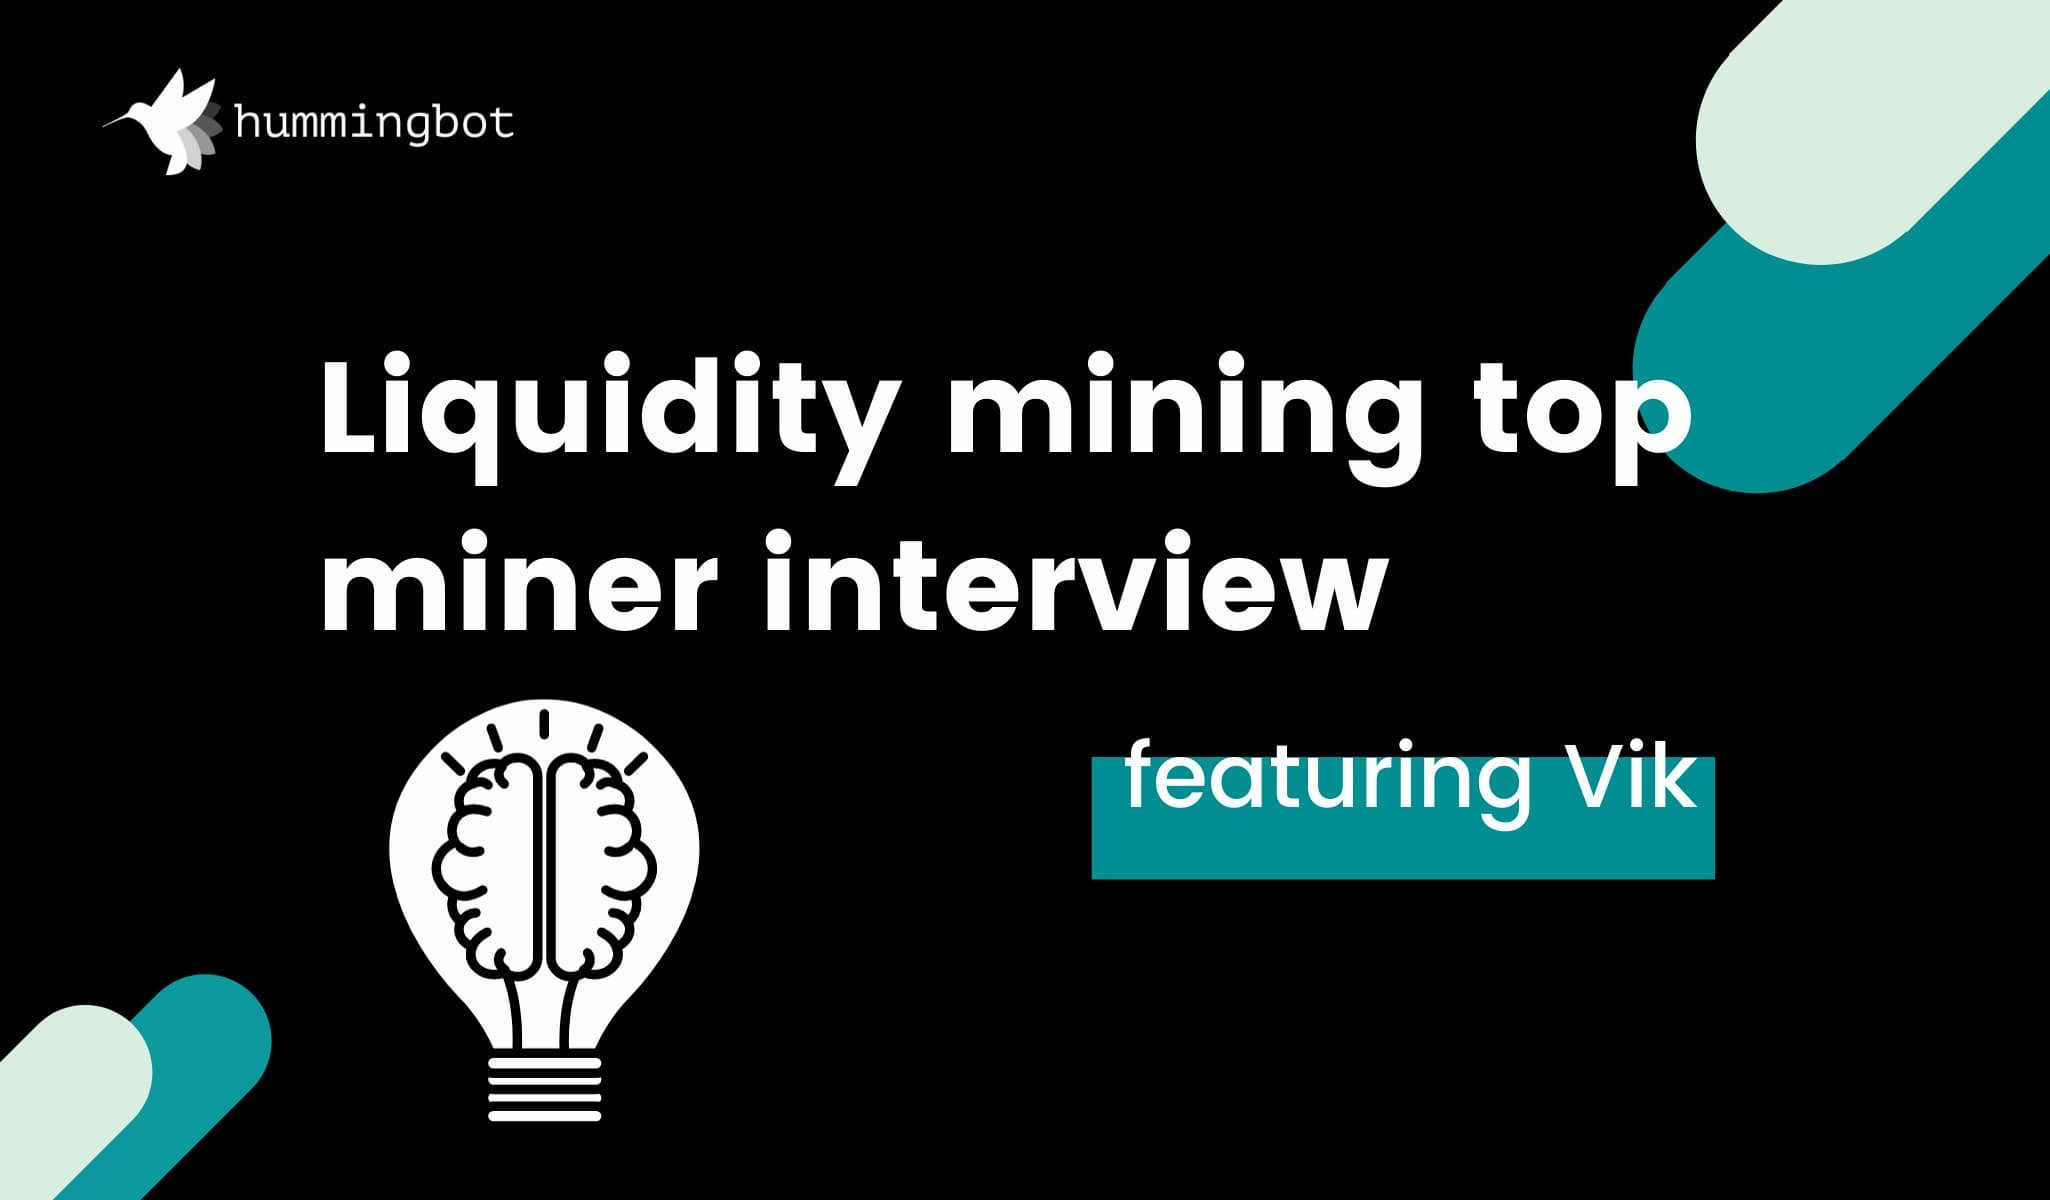 Top liquidity miner interview featuring Vik